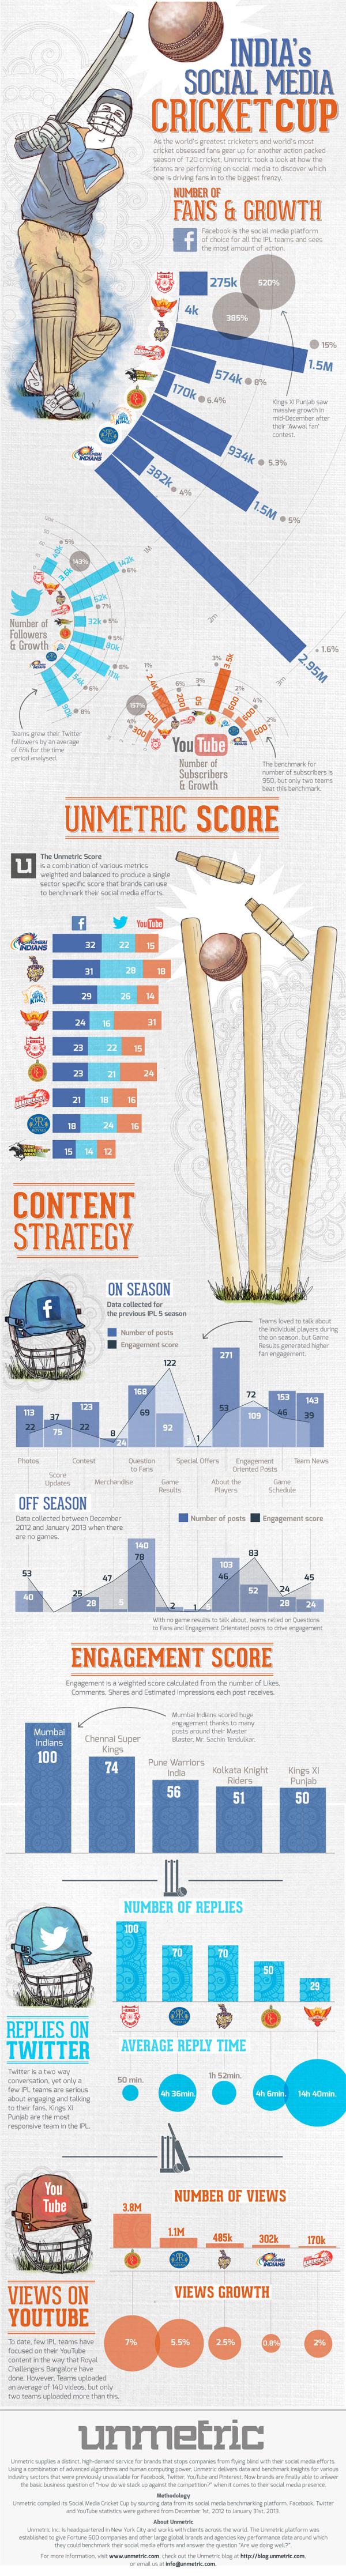 T20 Cricket social-media obsession